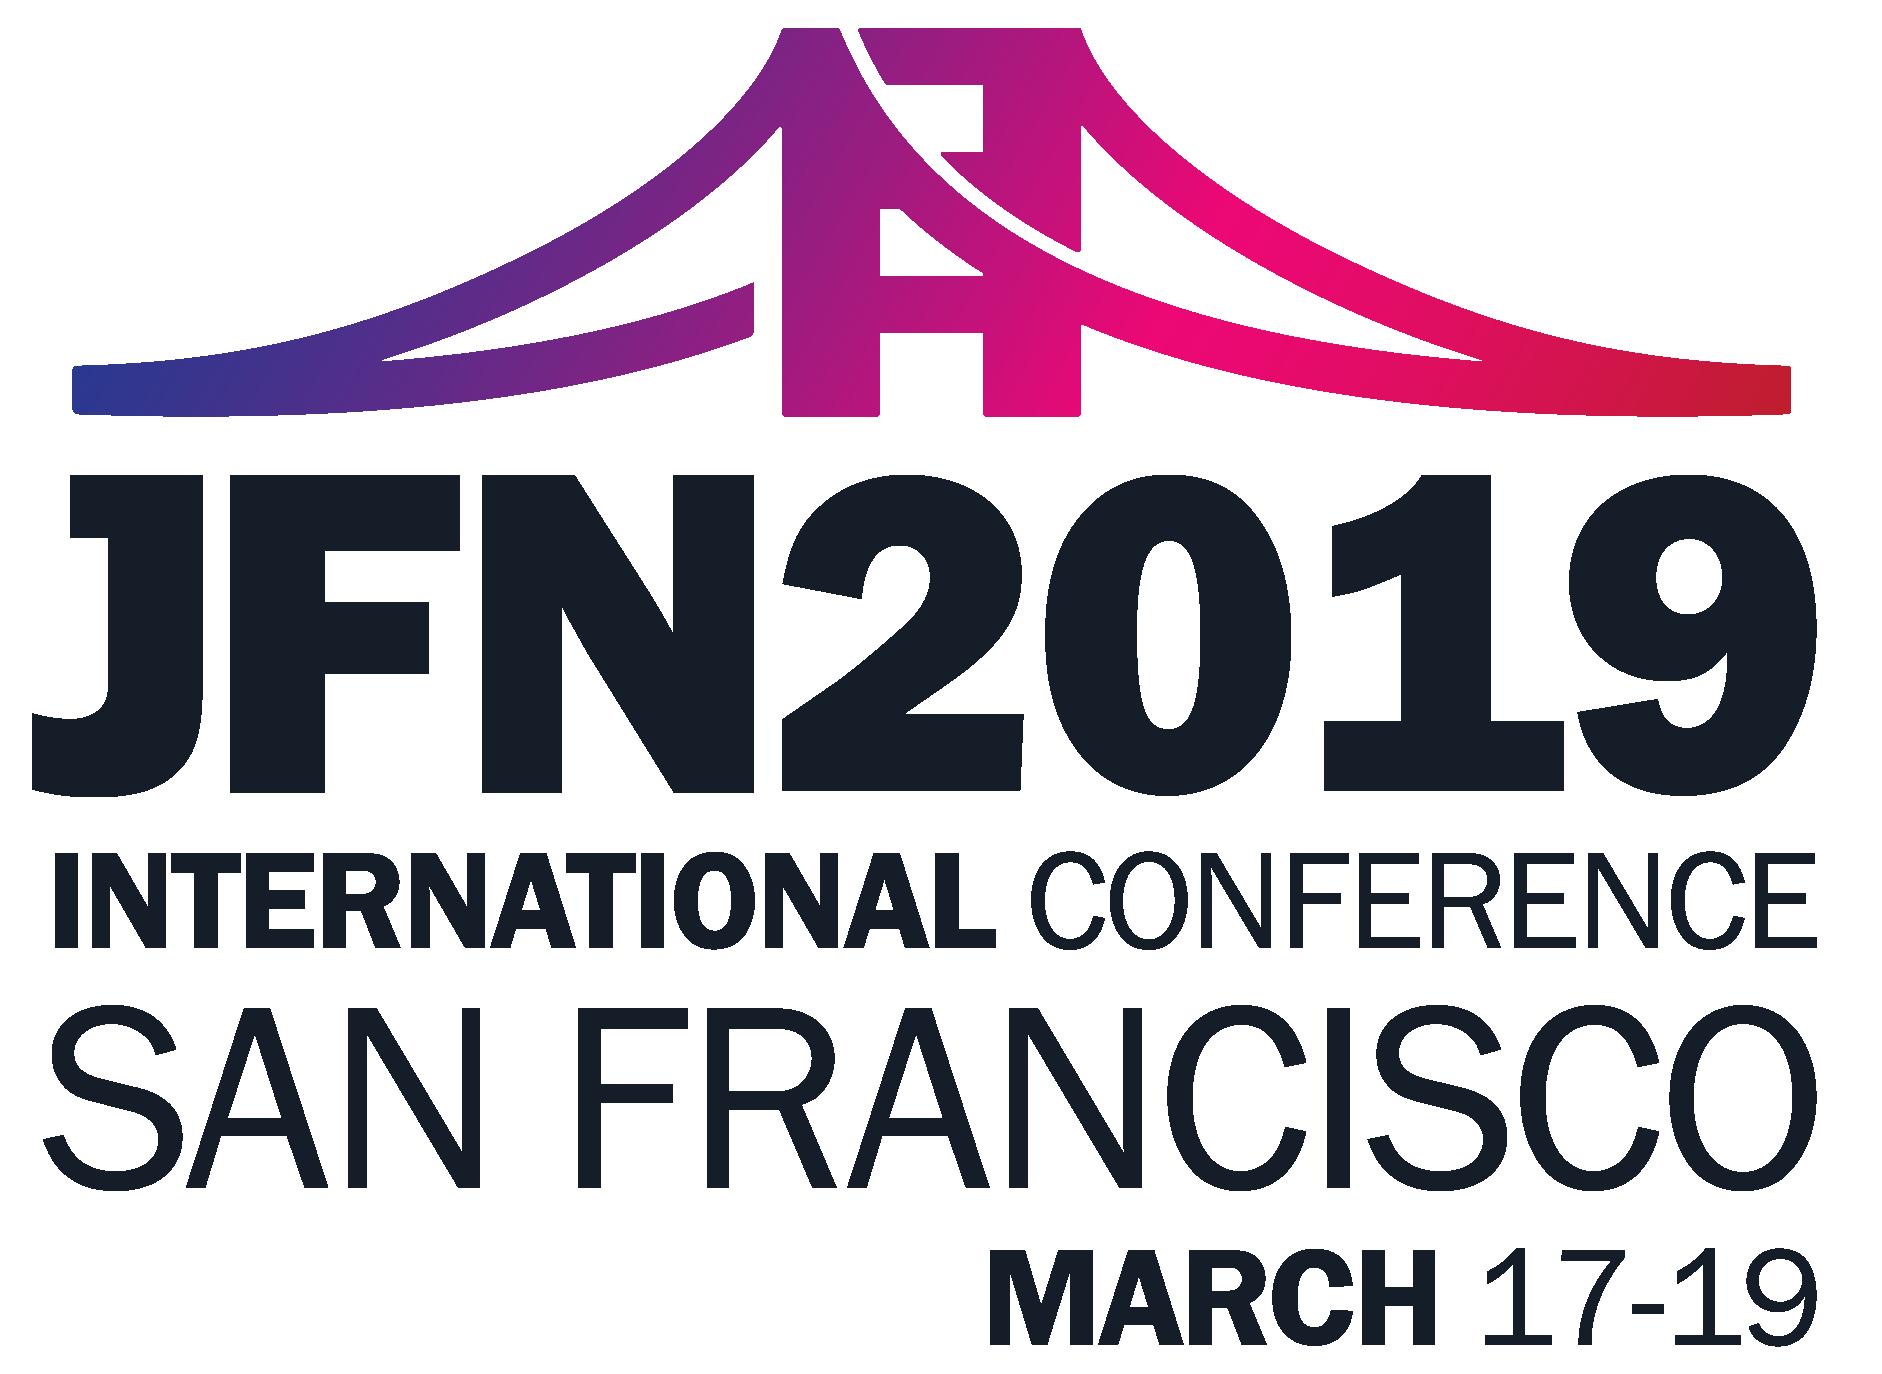 JFN 2019 International Conference (San Francisco) - Jewish